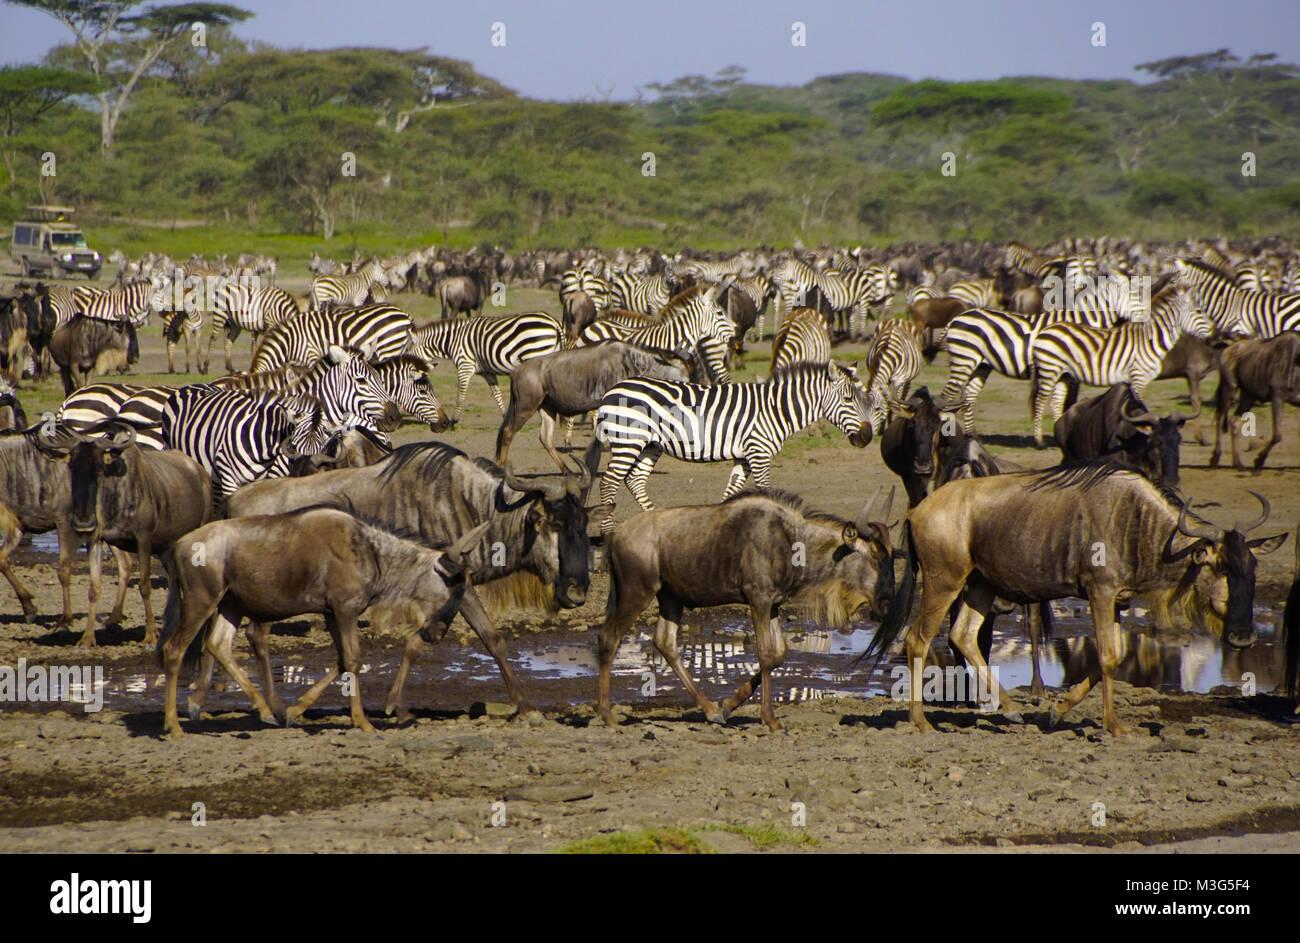 Gnus und Zebras auf der Serengeti, Tansania Stockbild